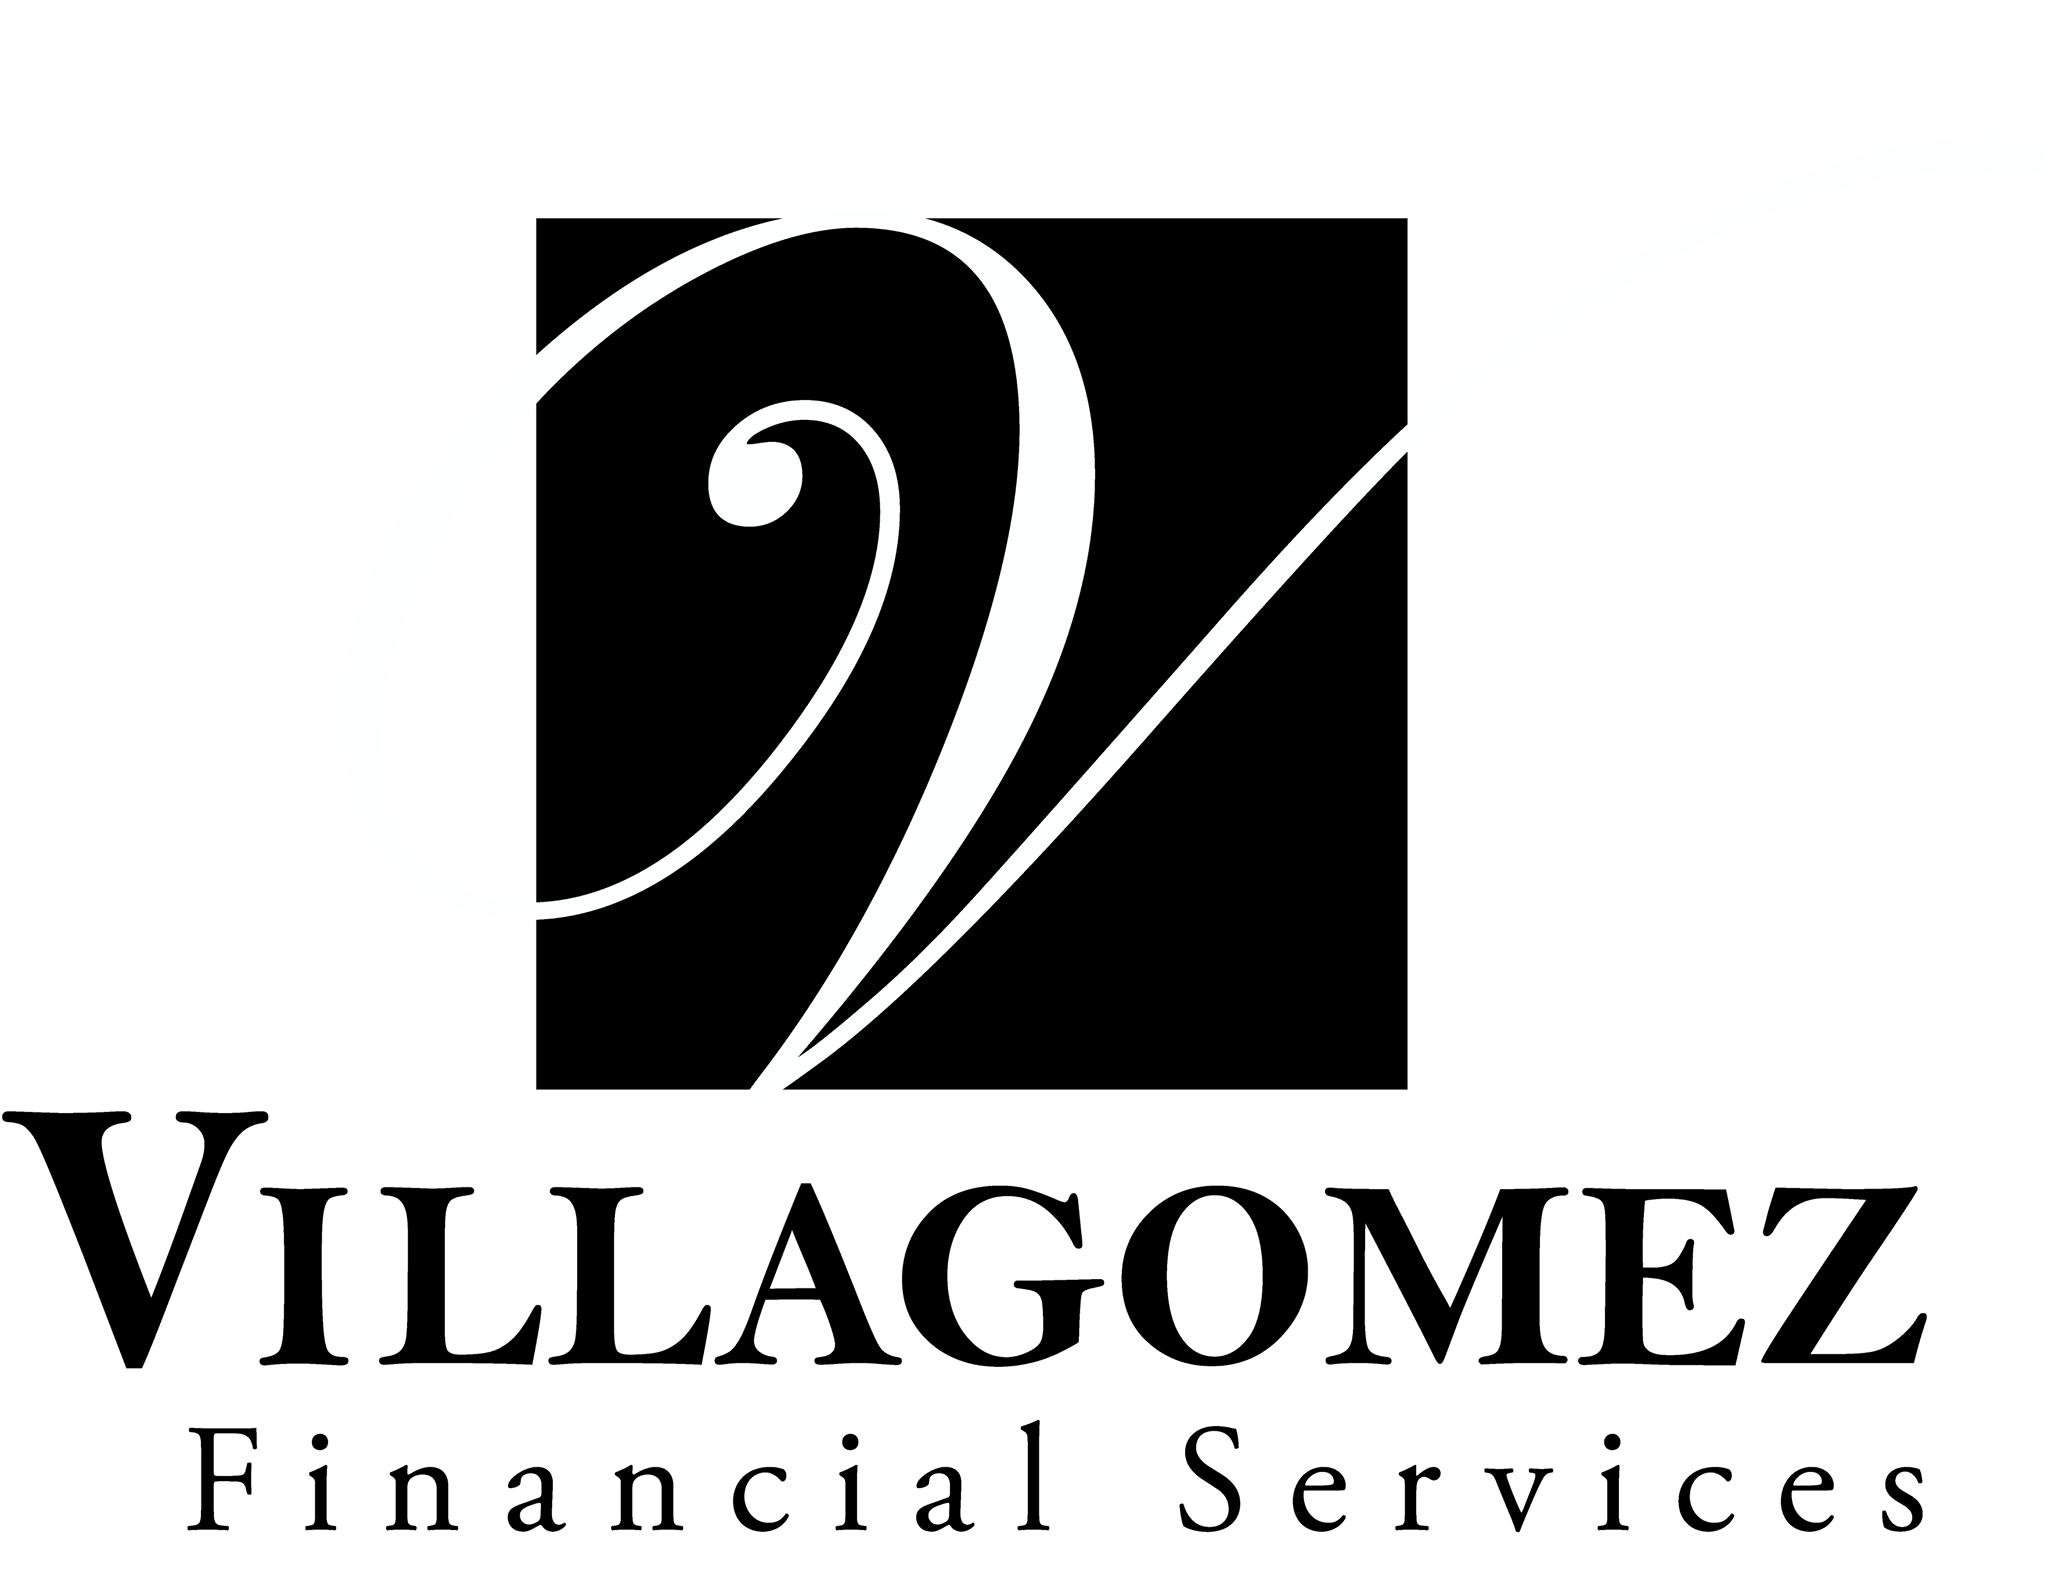 Villagomez Financial Services